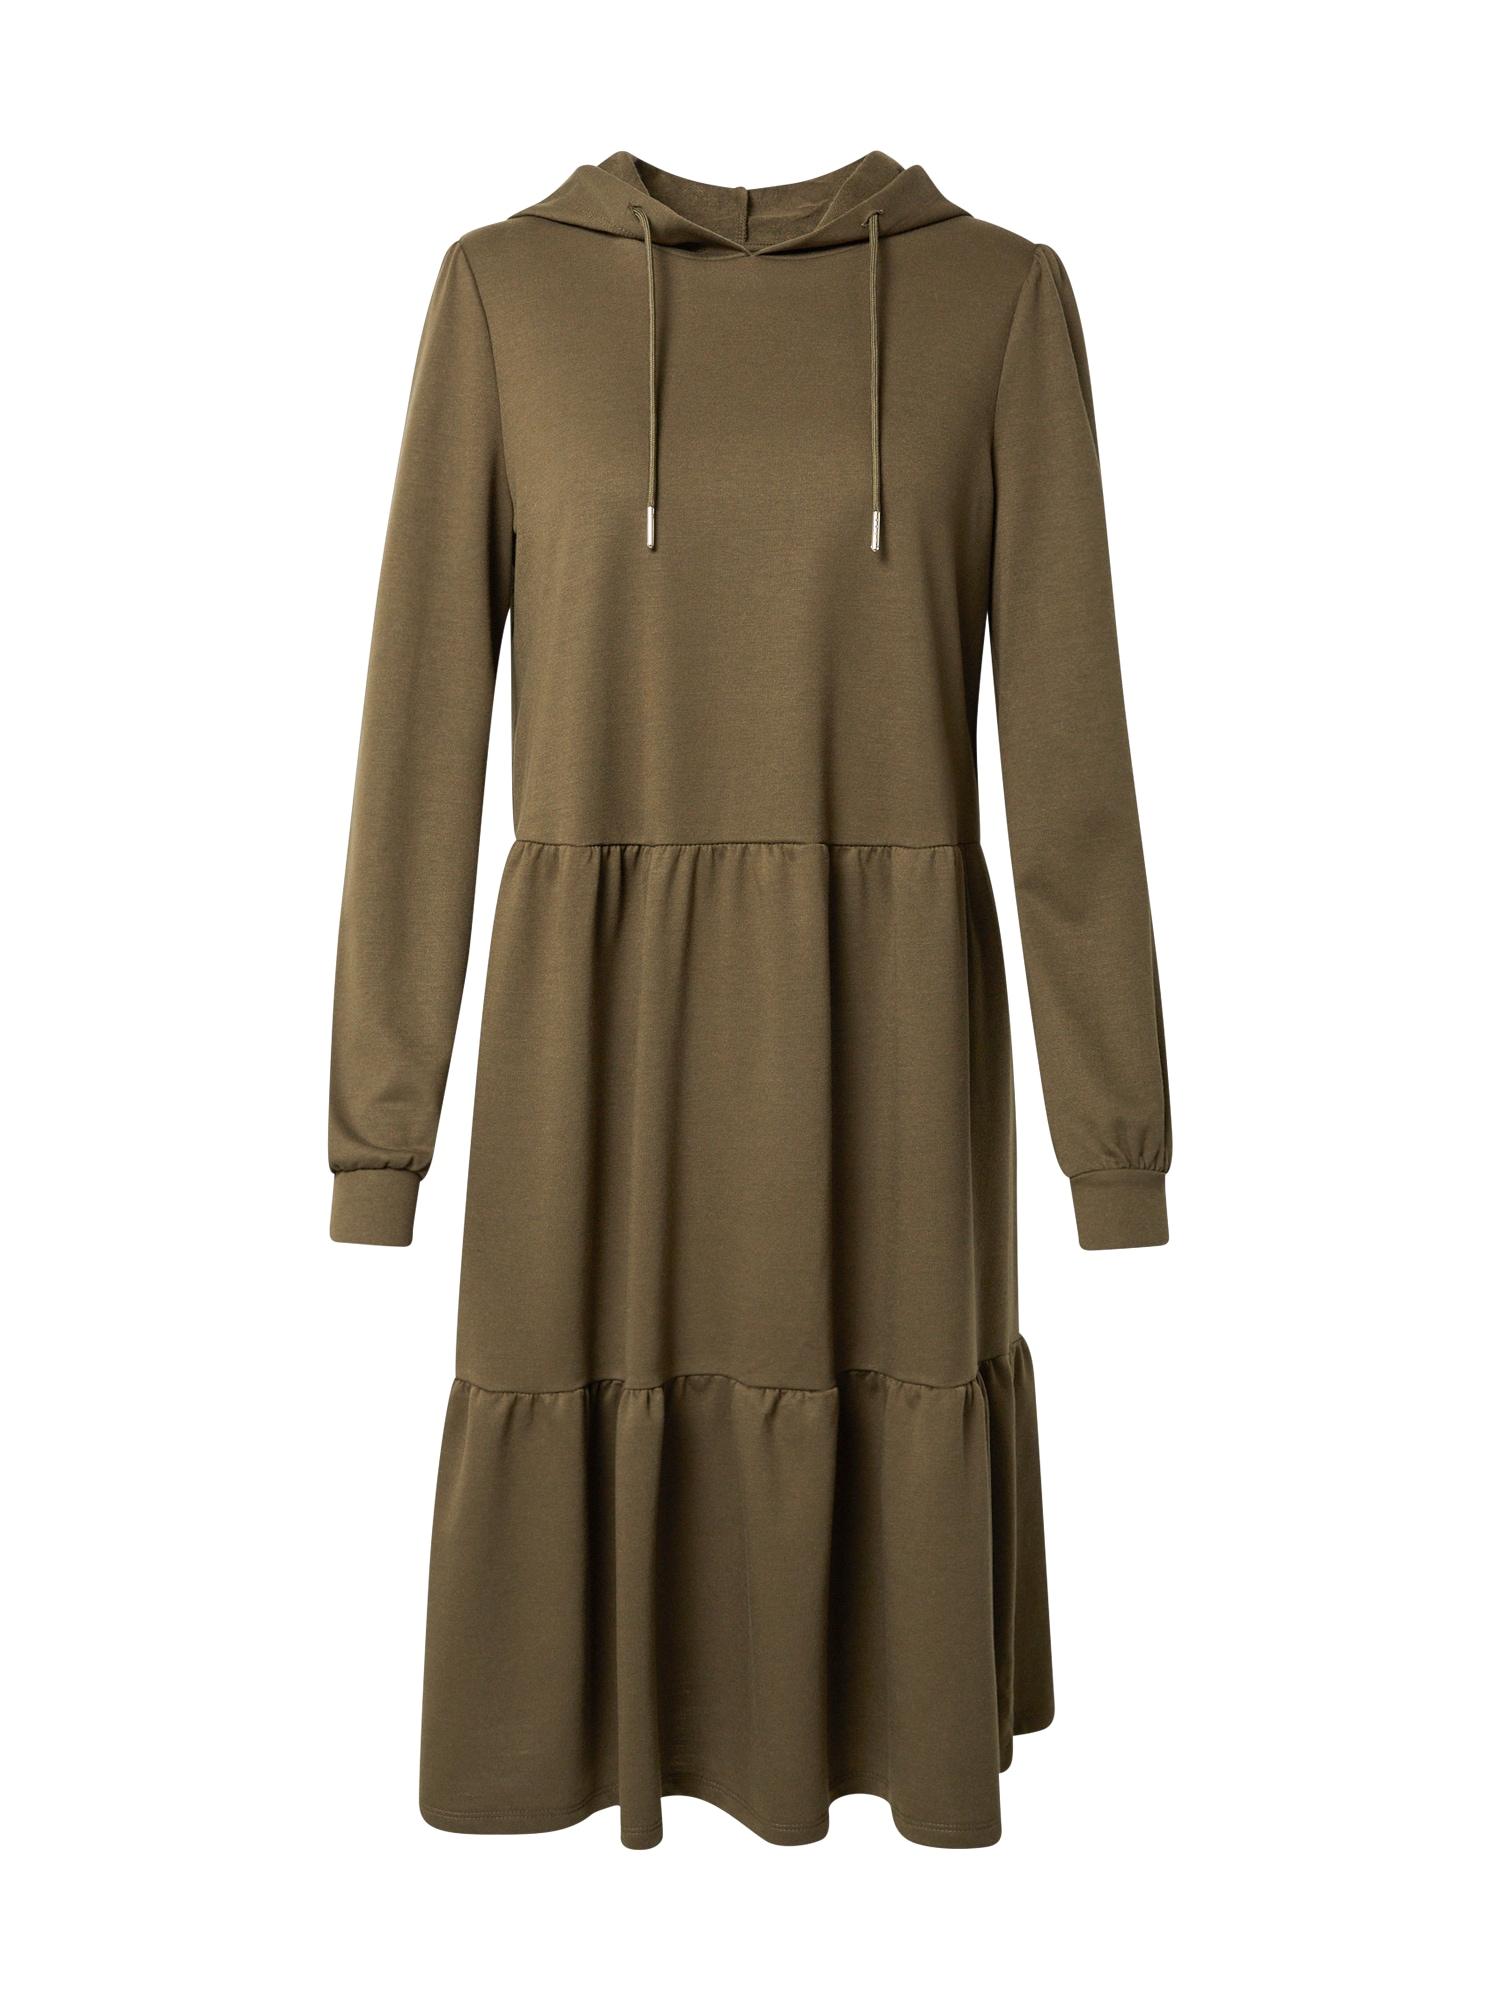 JACQUELINE de YONG Suknelė rusvai žalia